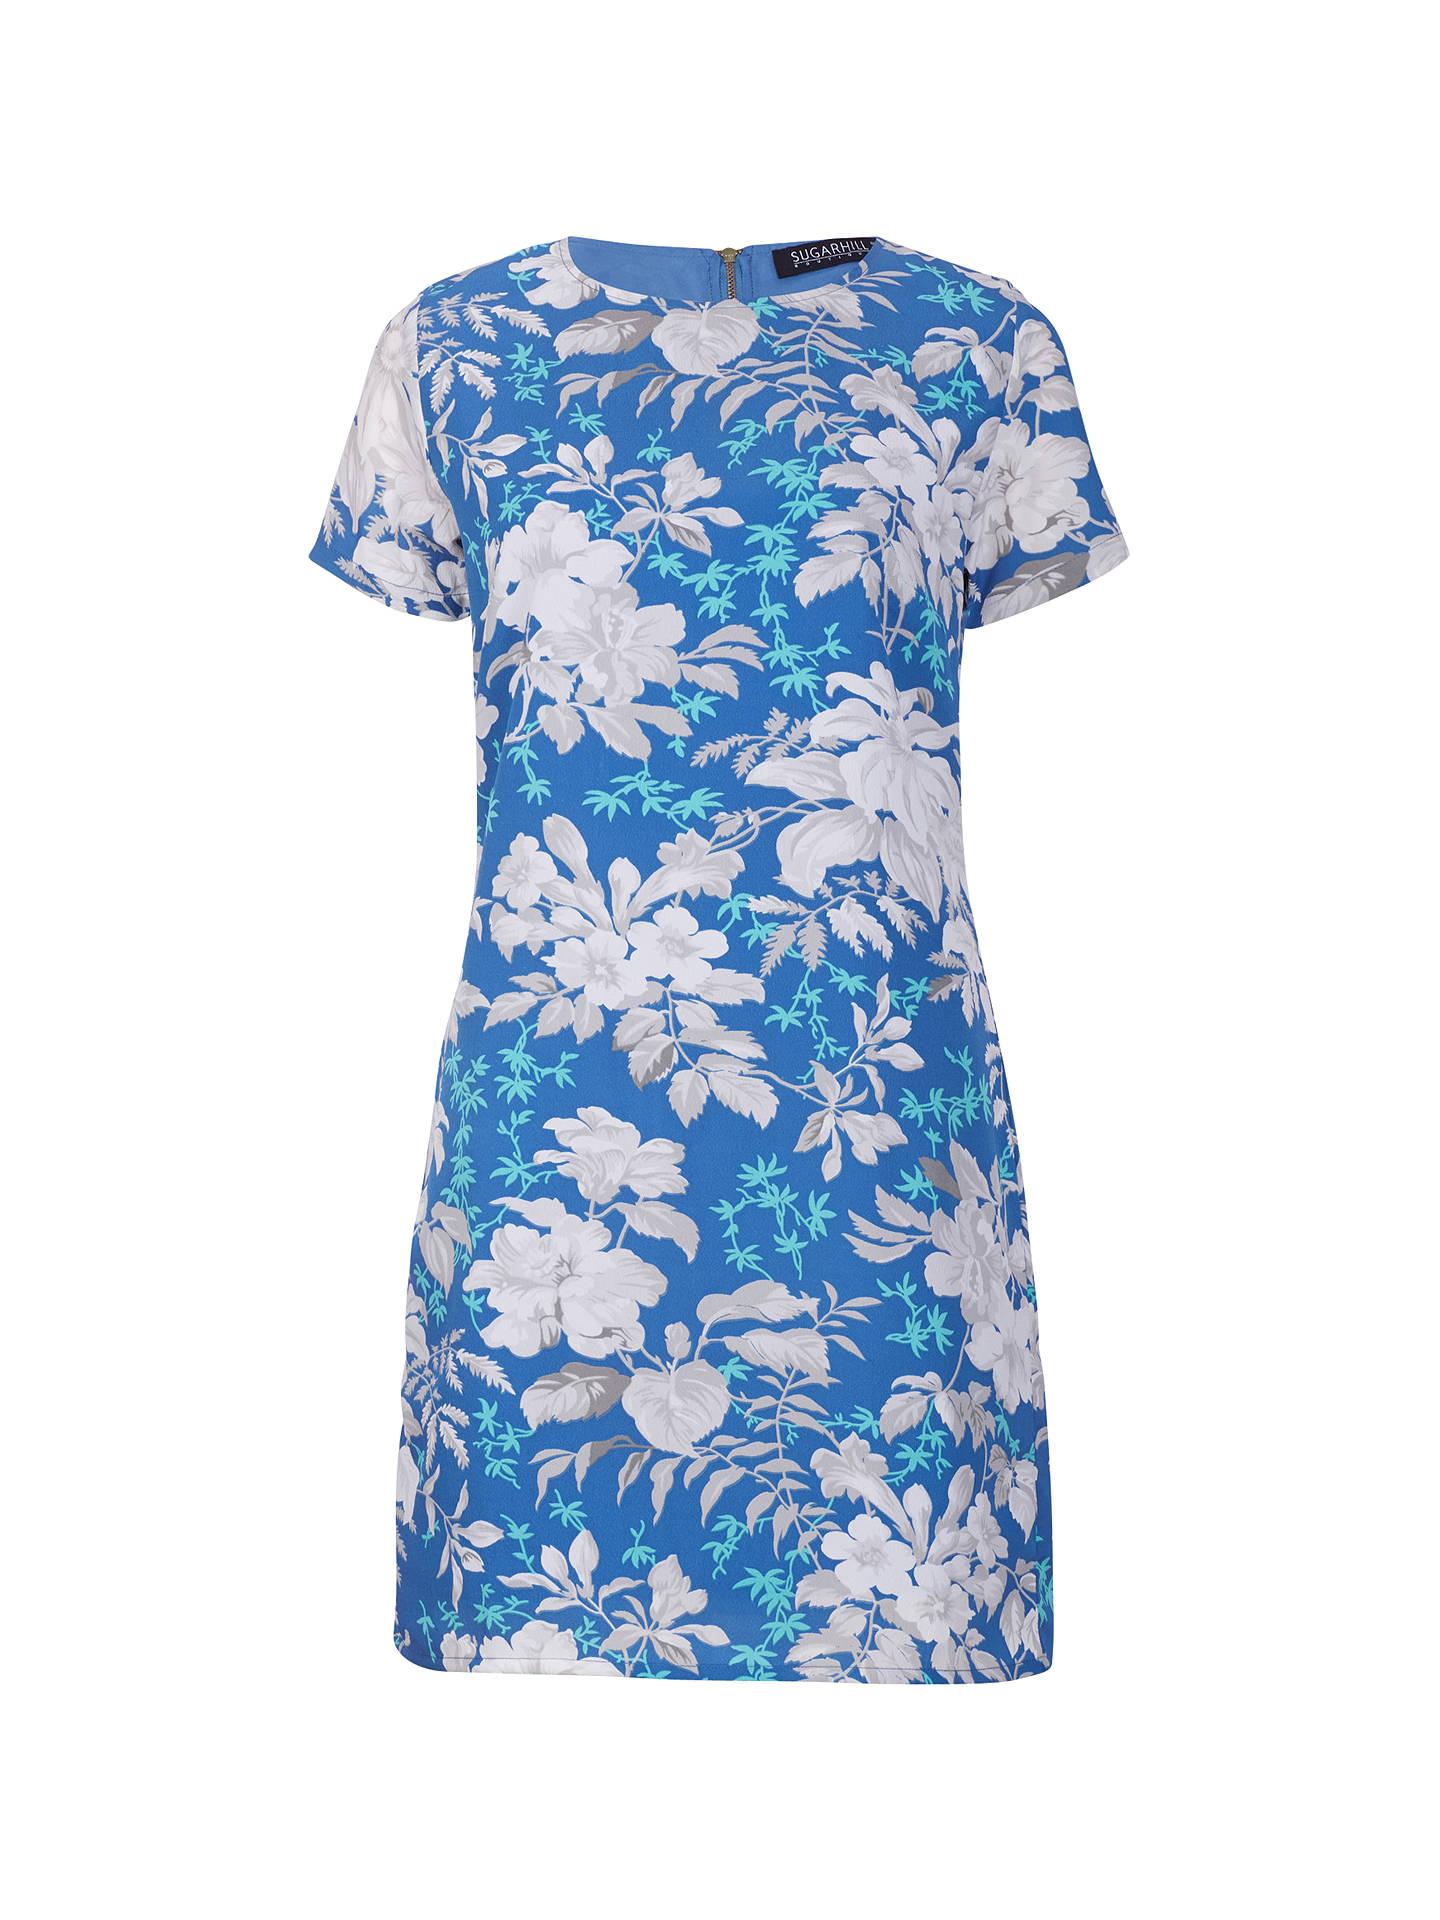 00edd90a5ffd2 Buy Sugarhill Boutique Hawaiian Flower Tunic Dress, Cornflower Blue, 8  Online at johnlewis.